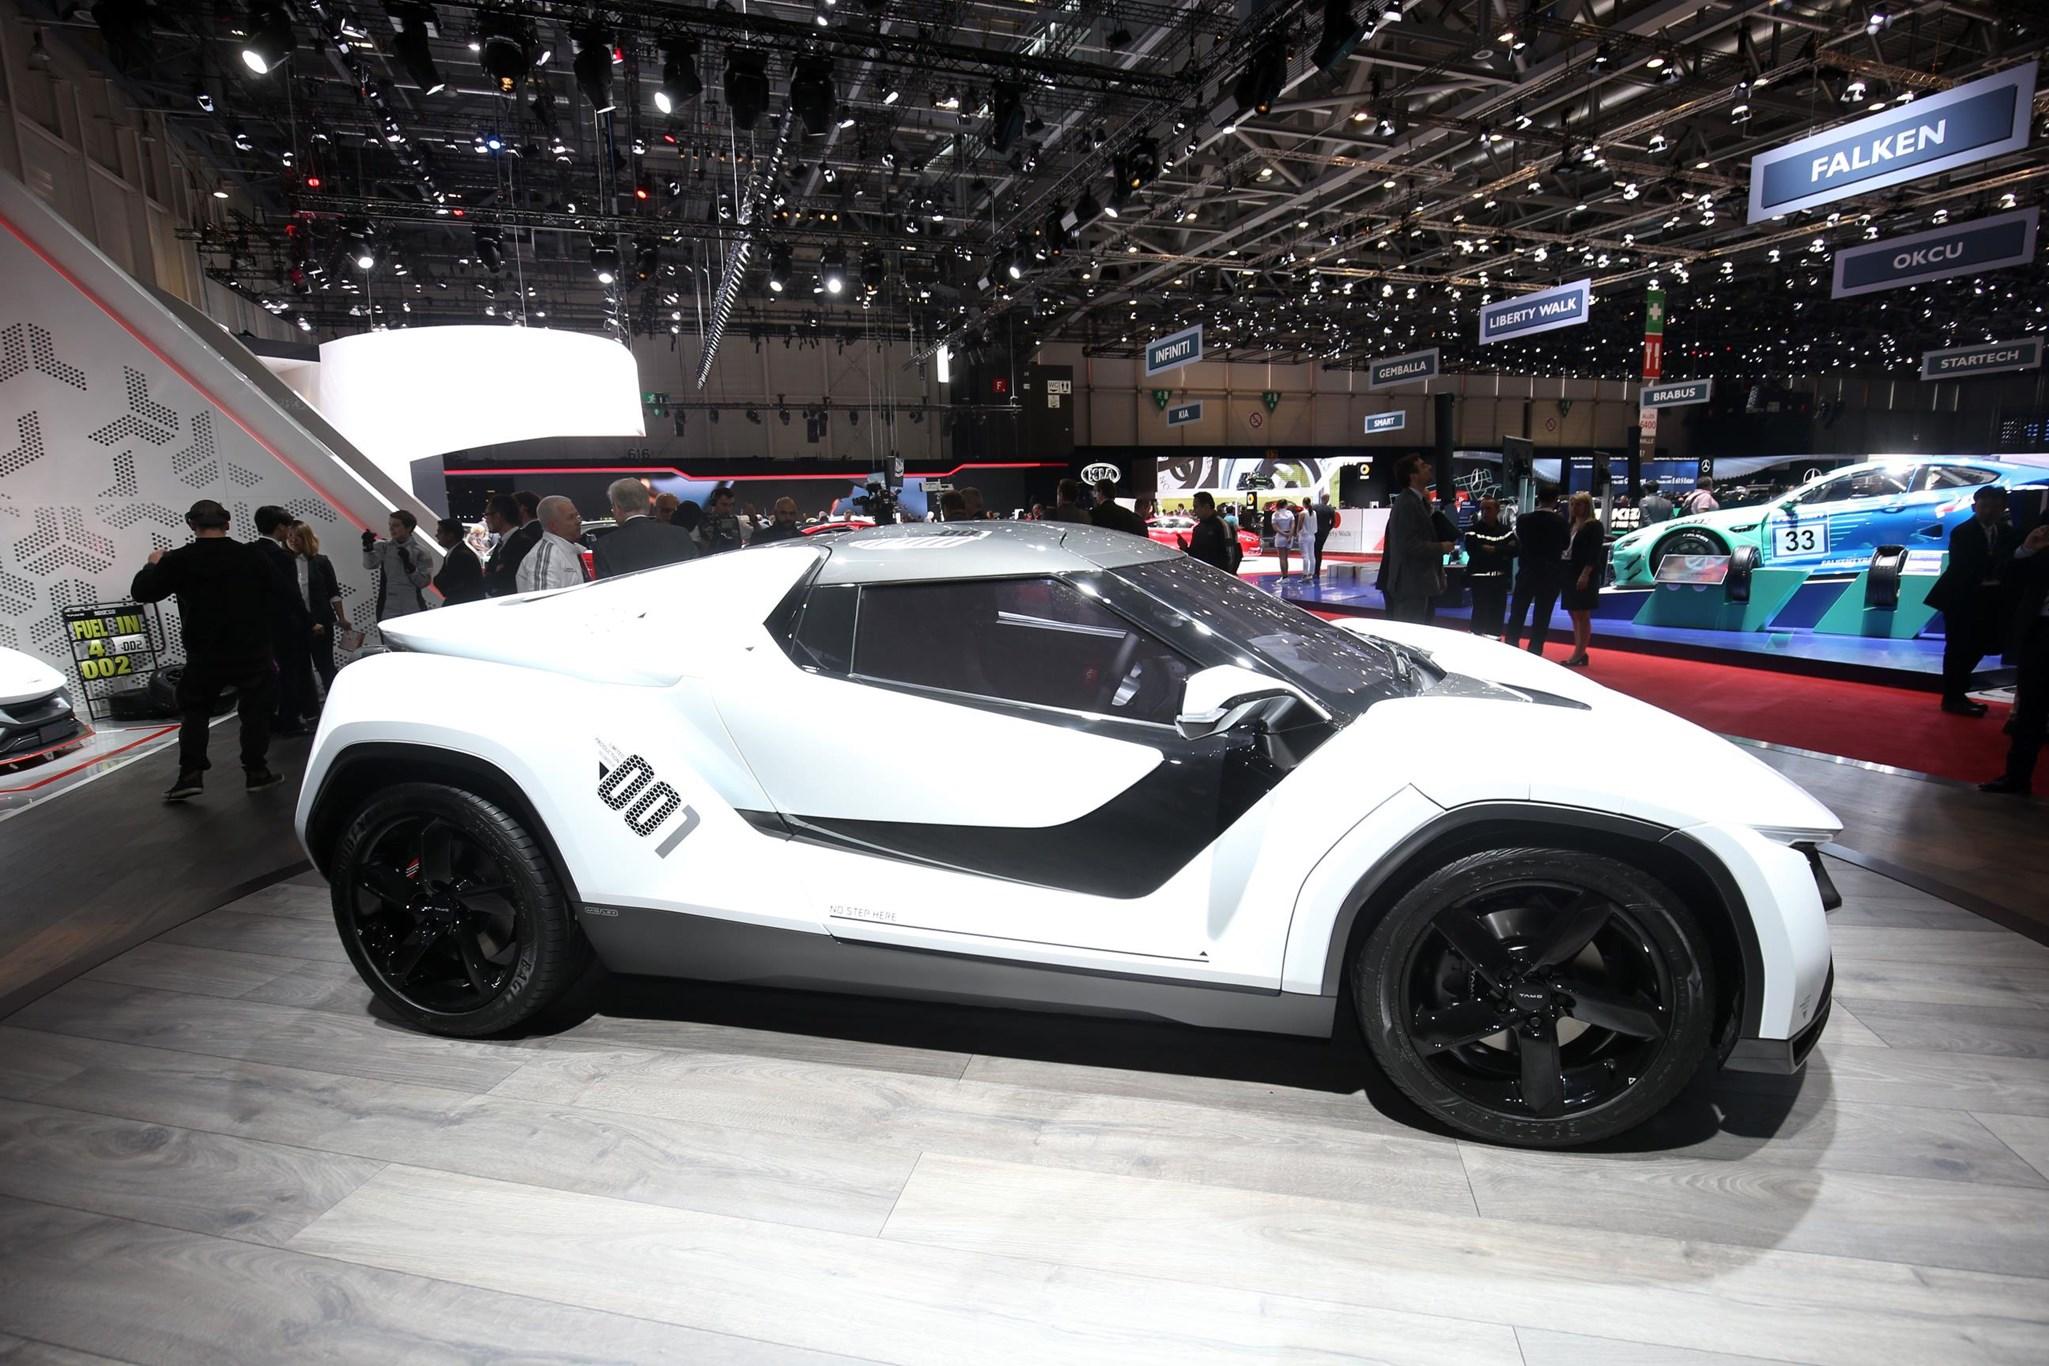 Hummer Kit Car Uk